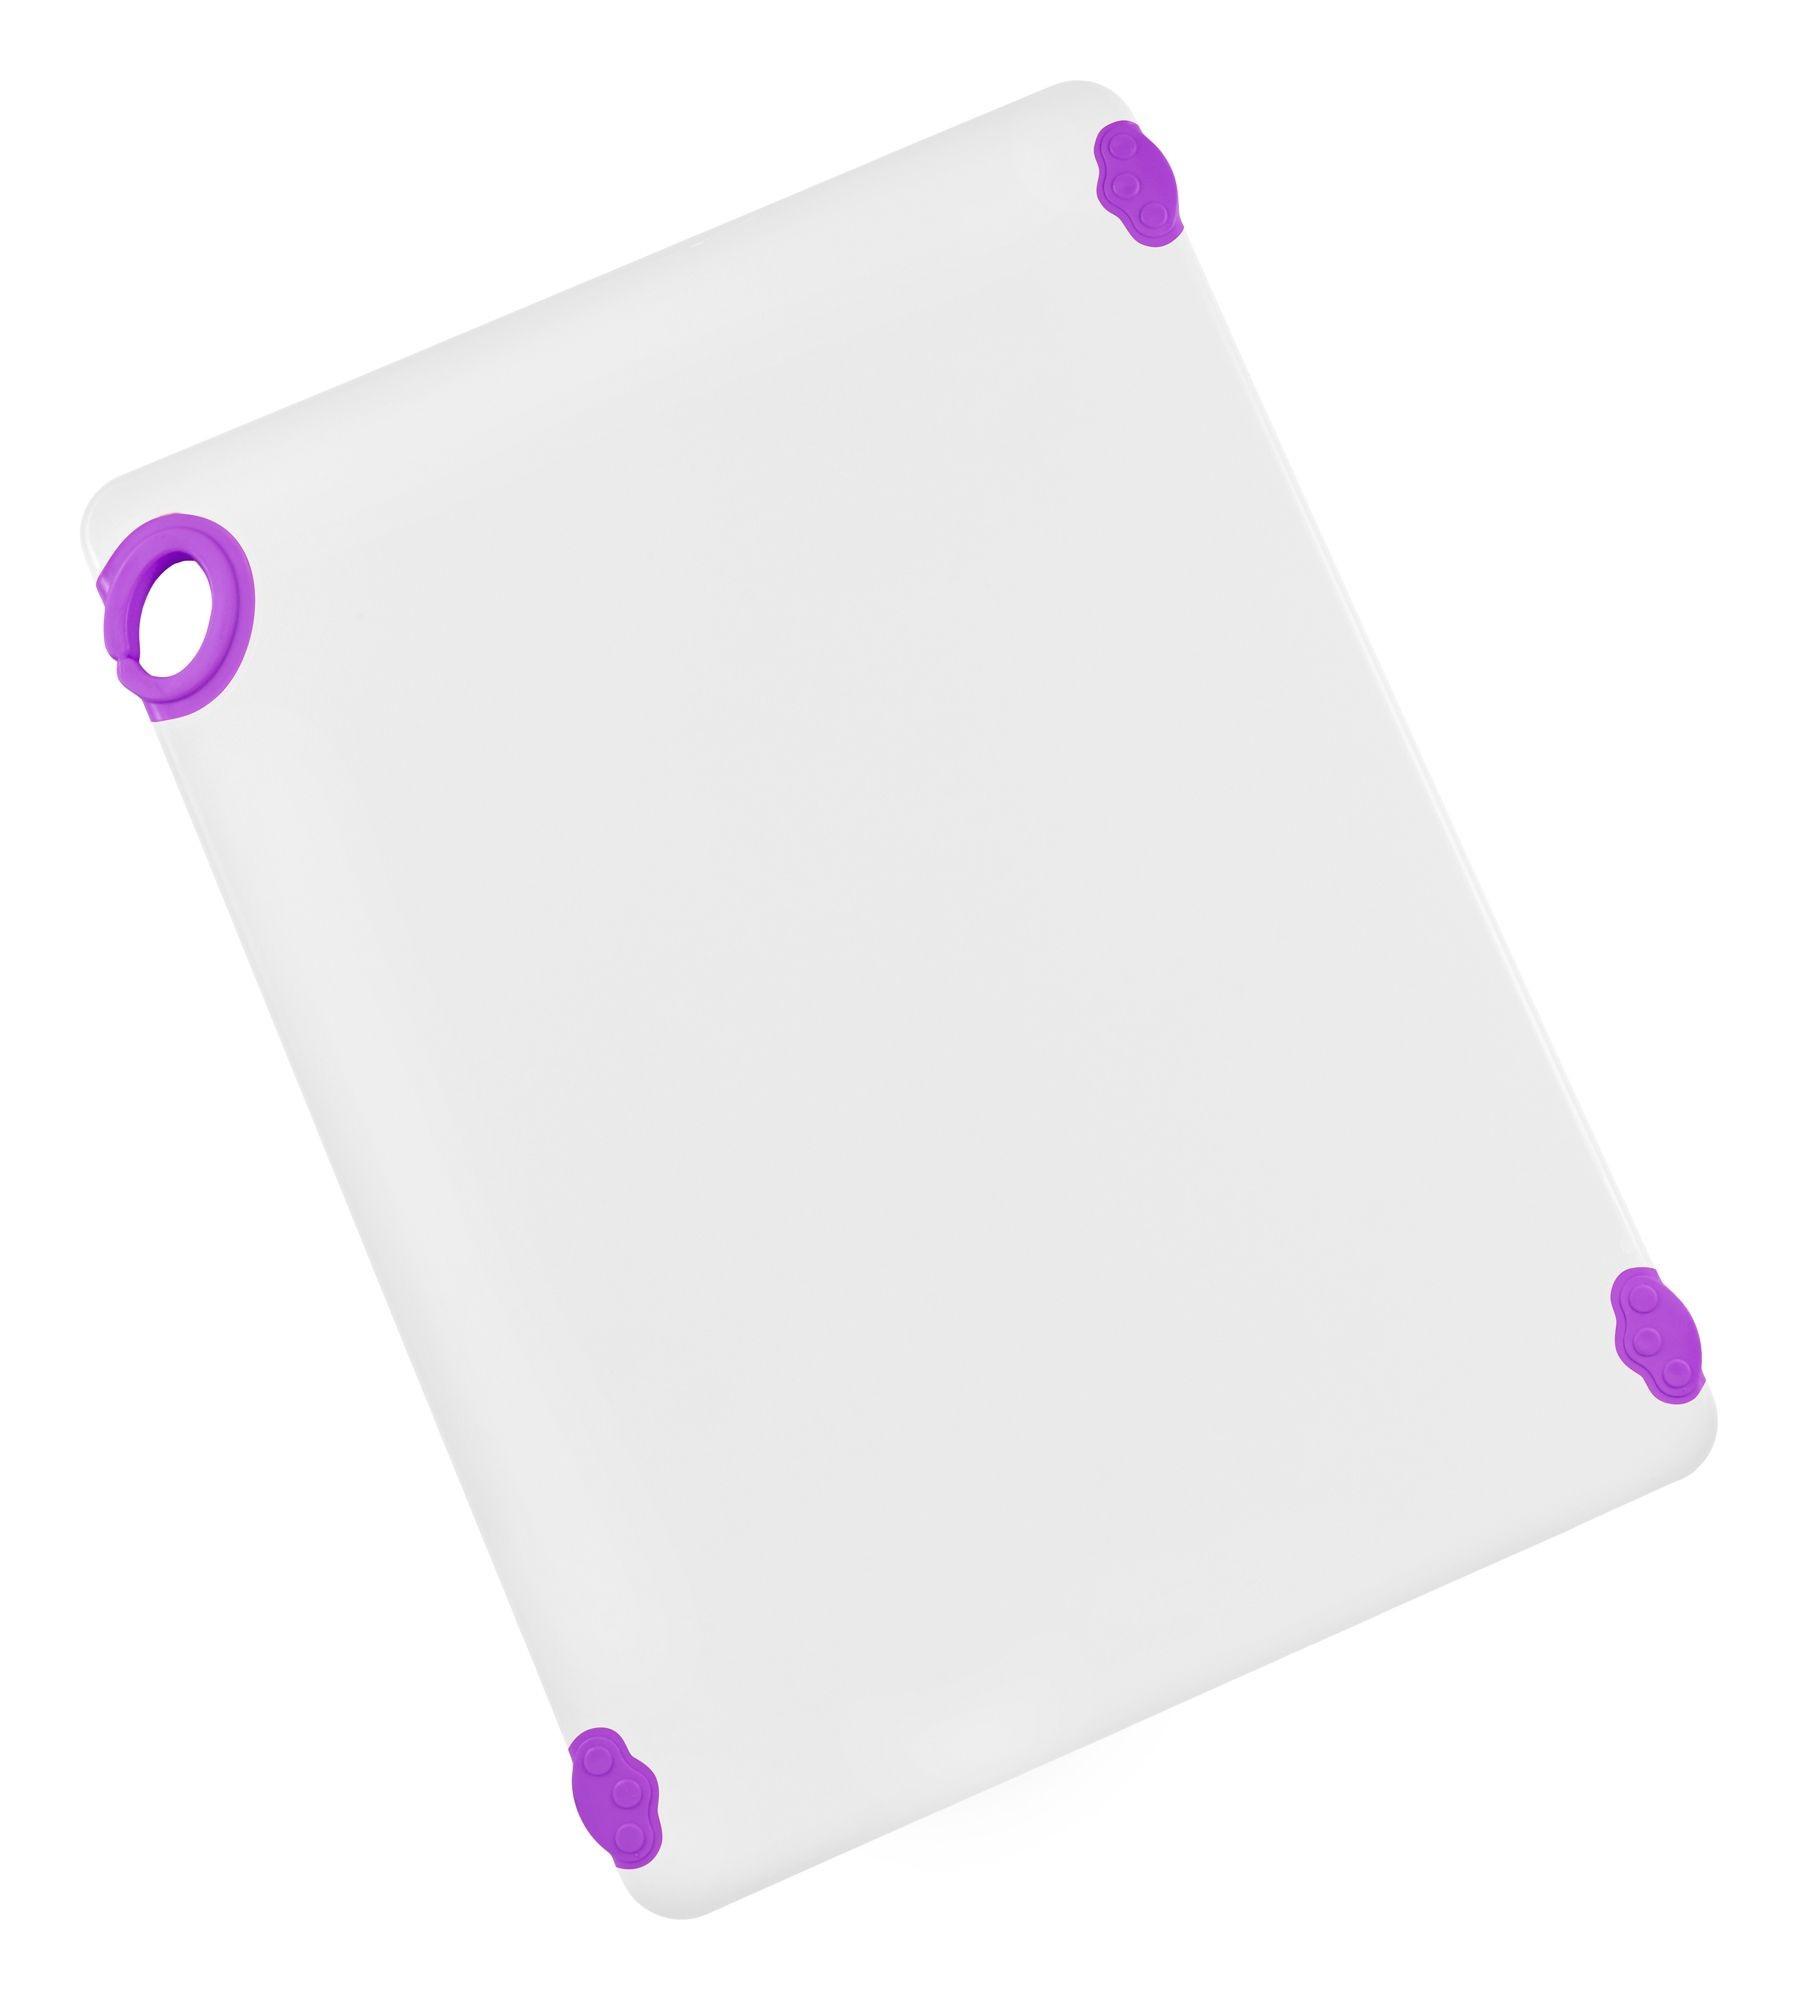 "Winco CBN-1824PP Purple StatikBoard Cutting Board with Hook, 18"" x 24"" x 1/2"""